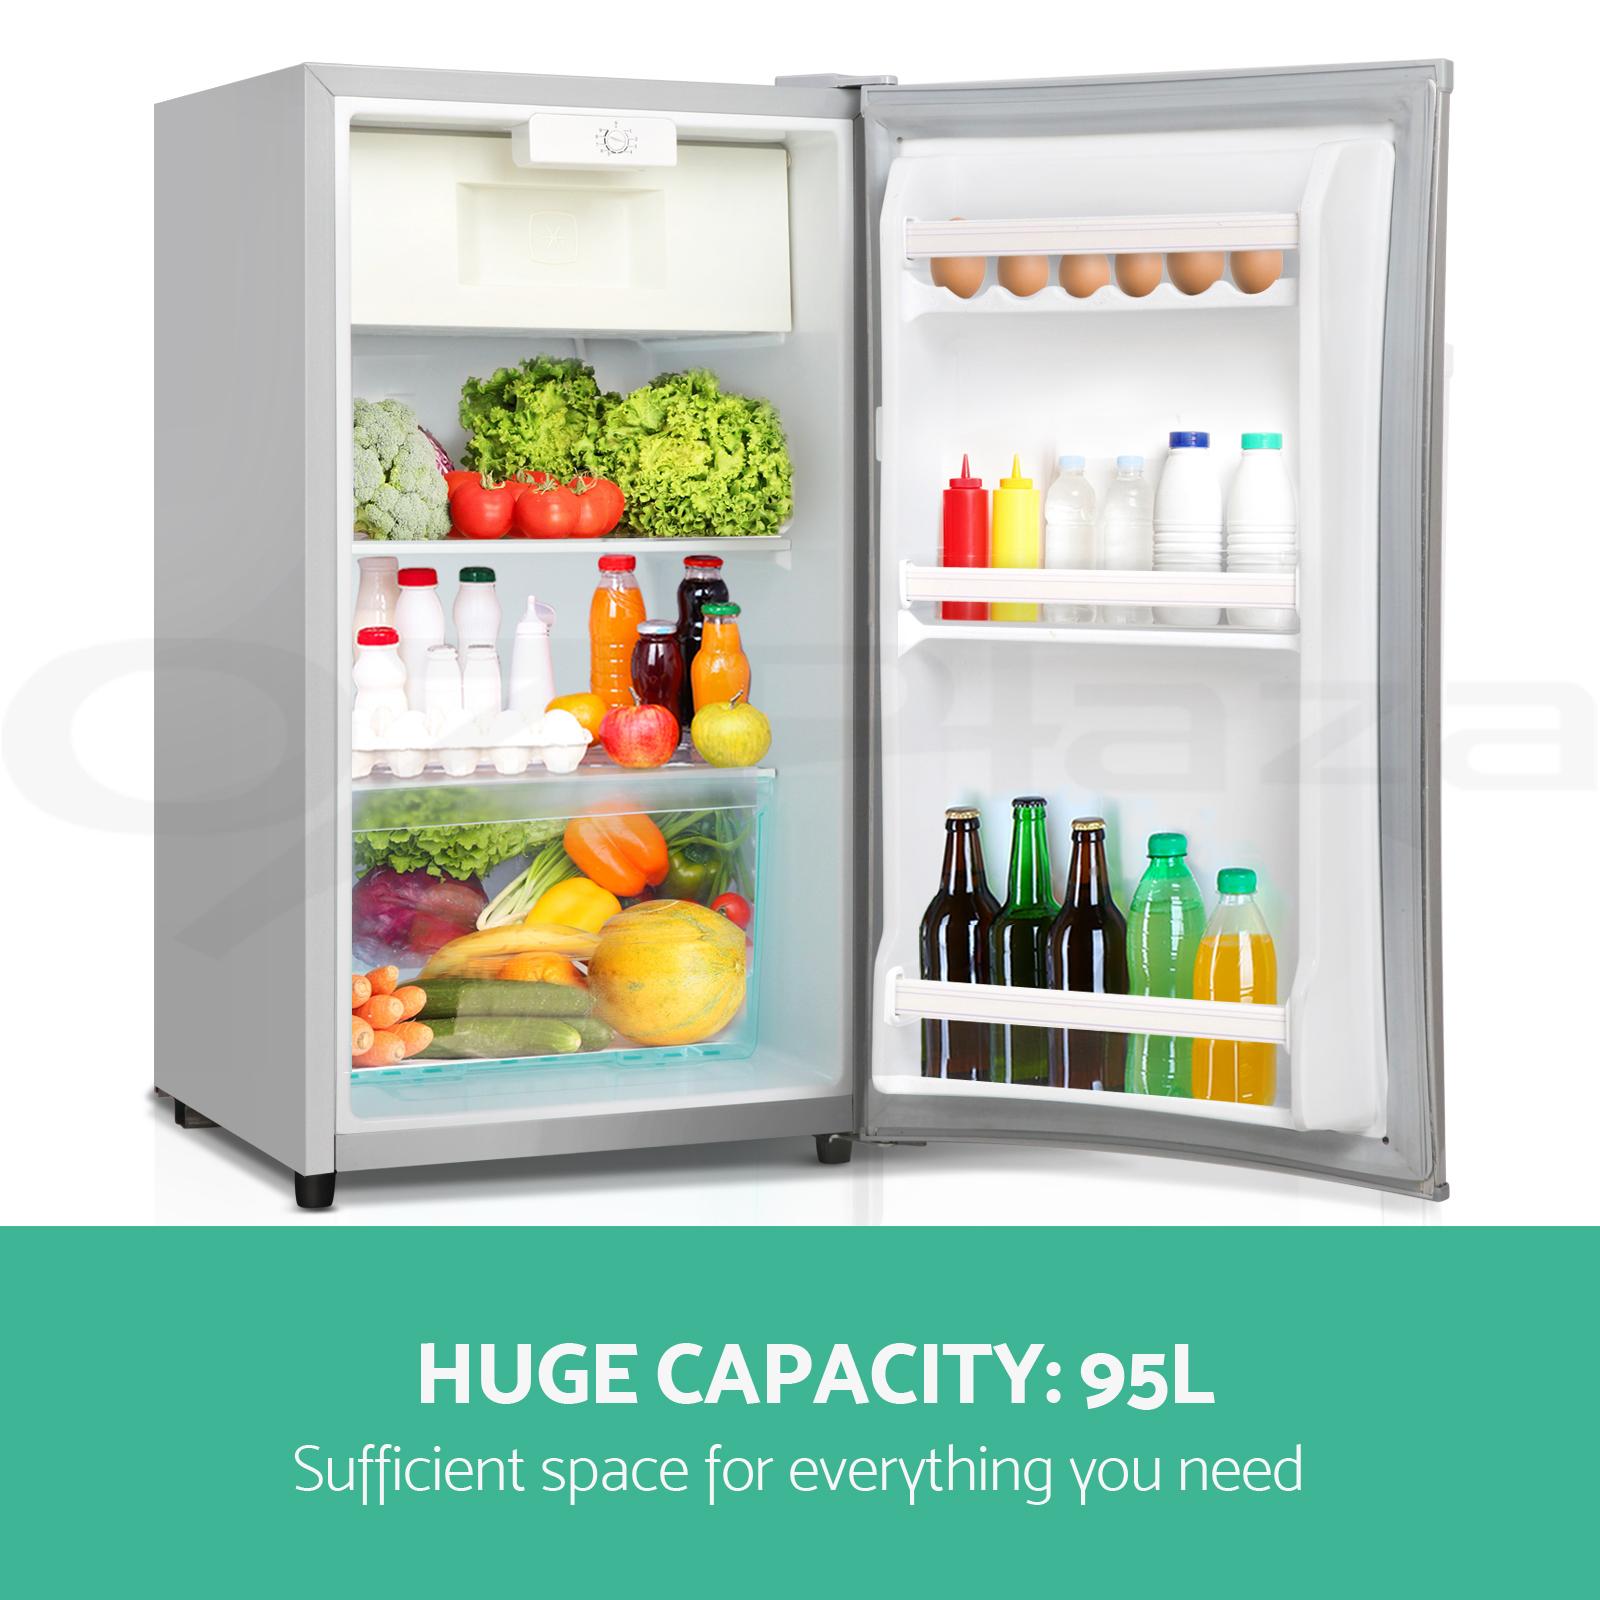 Huge Refrigerator 55l 95l 100l Portable Freezer Fridge Camping Car Boating Caravan